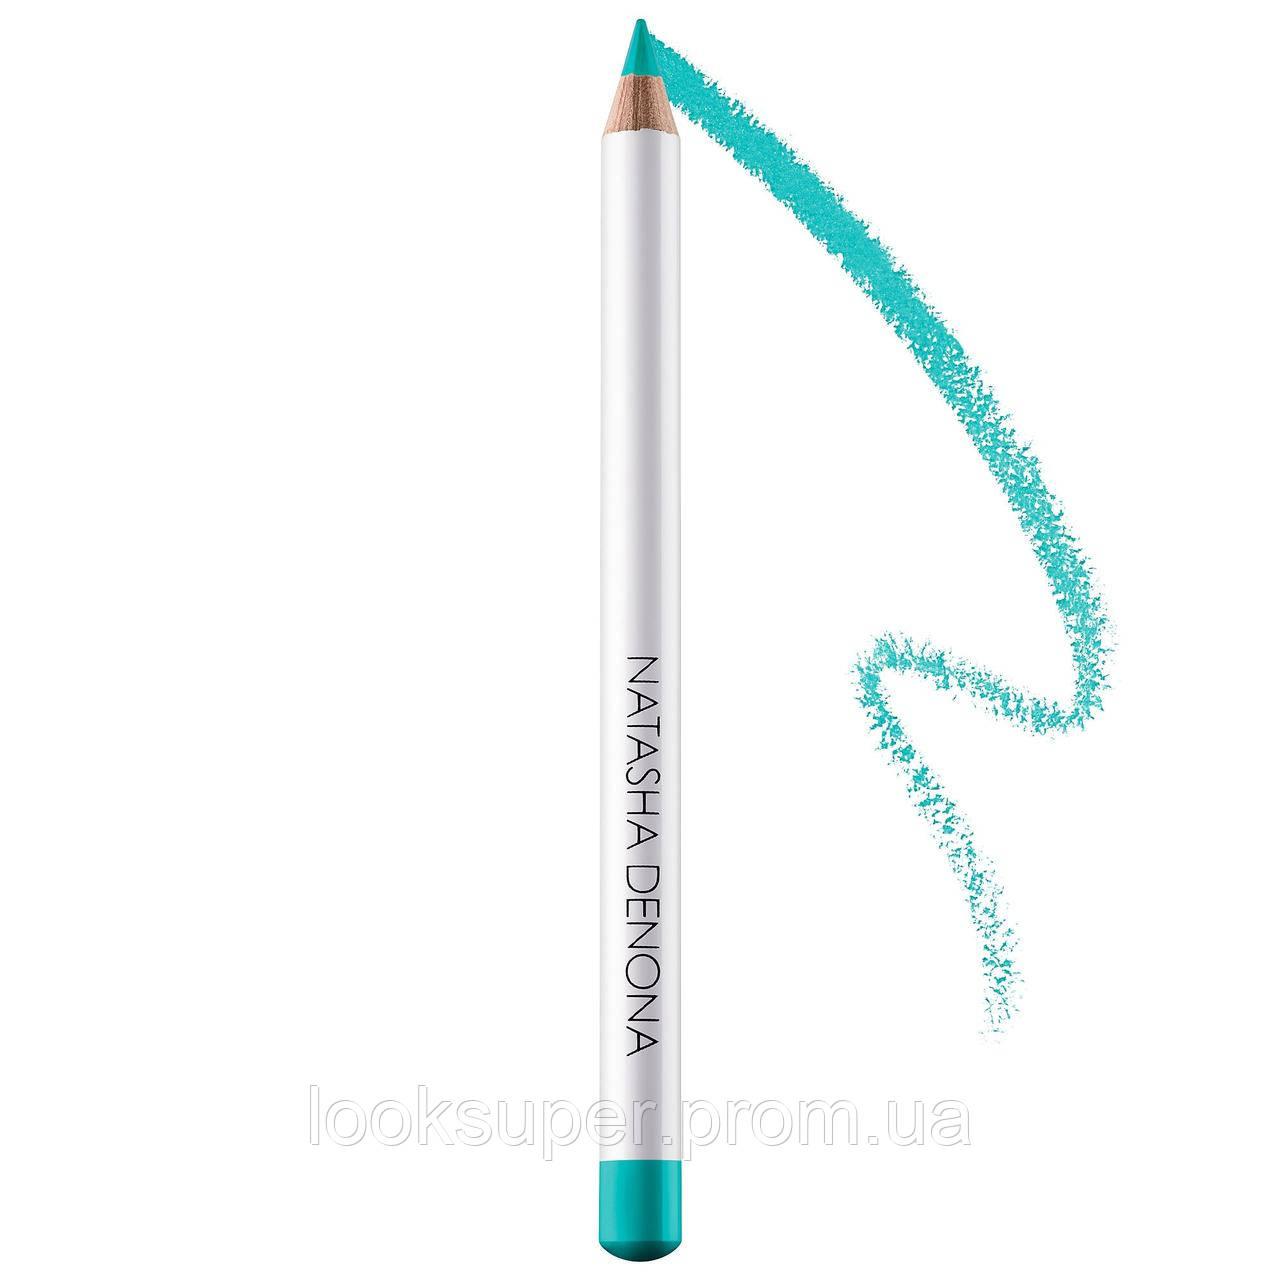 Карандаш для подводки глаз NATASHA DENONA  Eye Liner Pencil  aqua blue